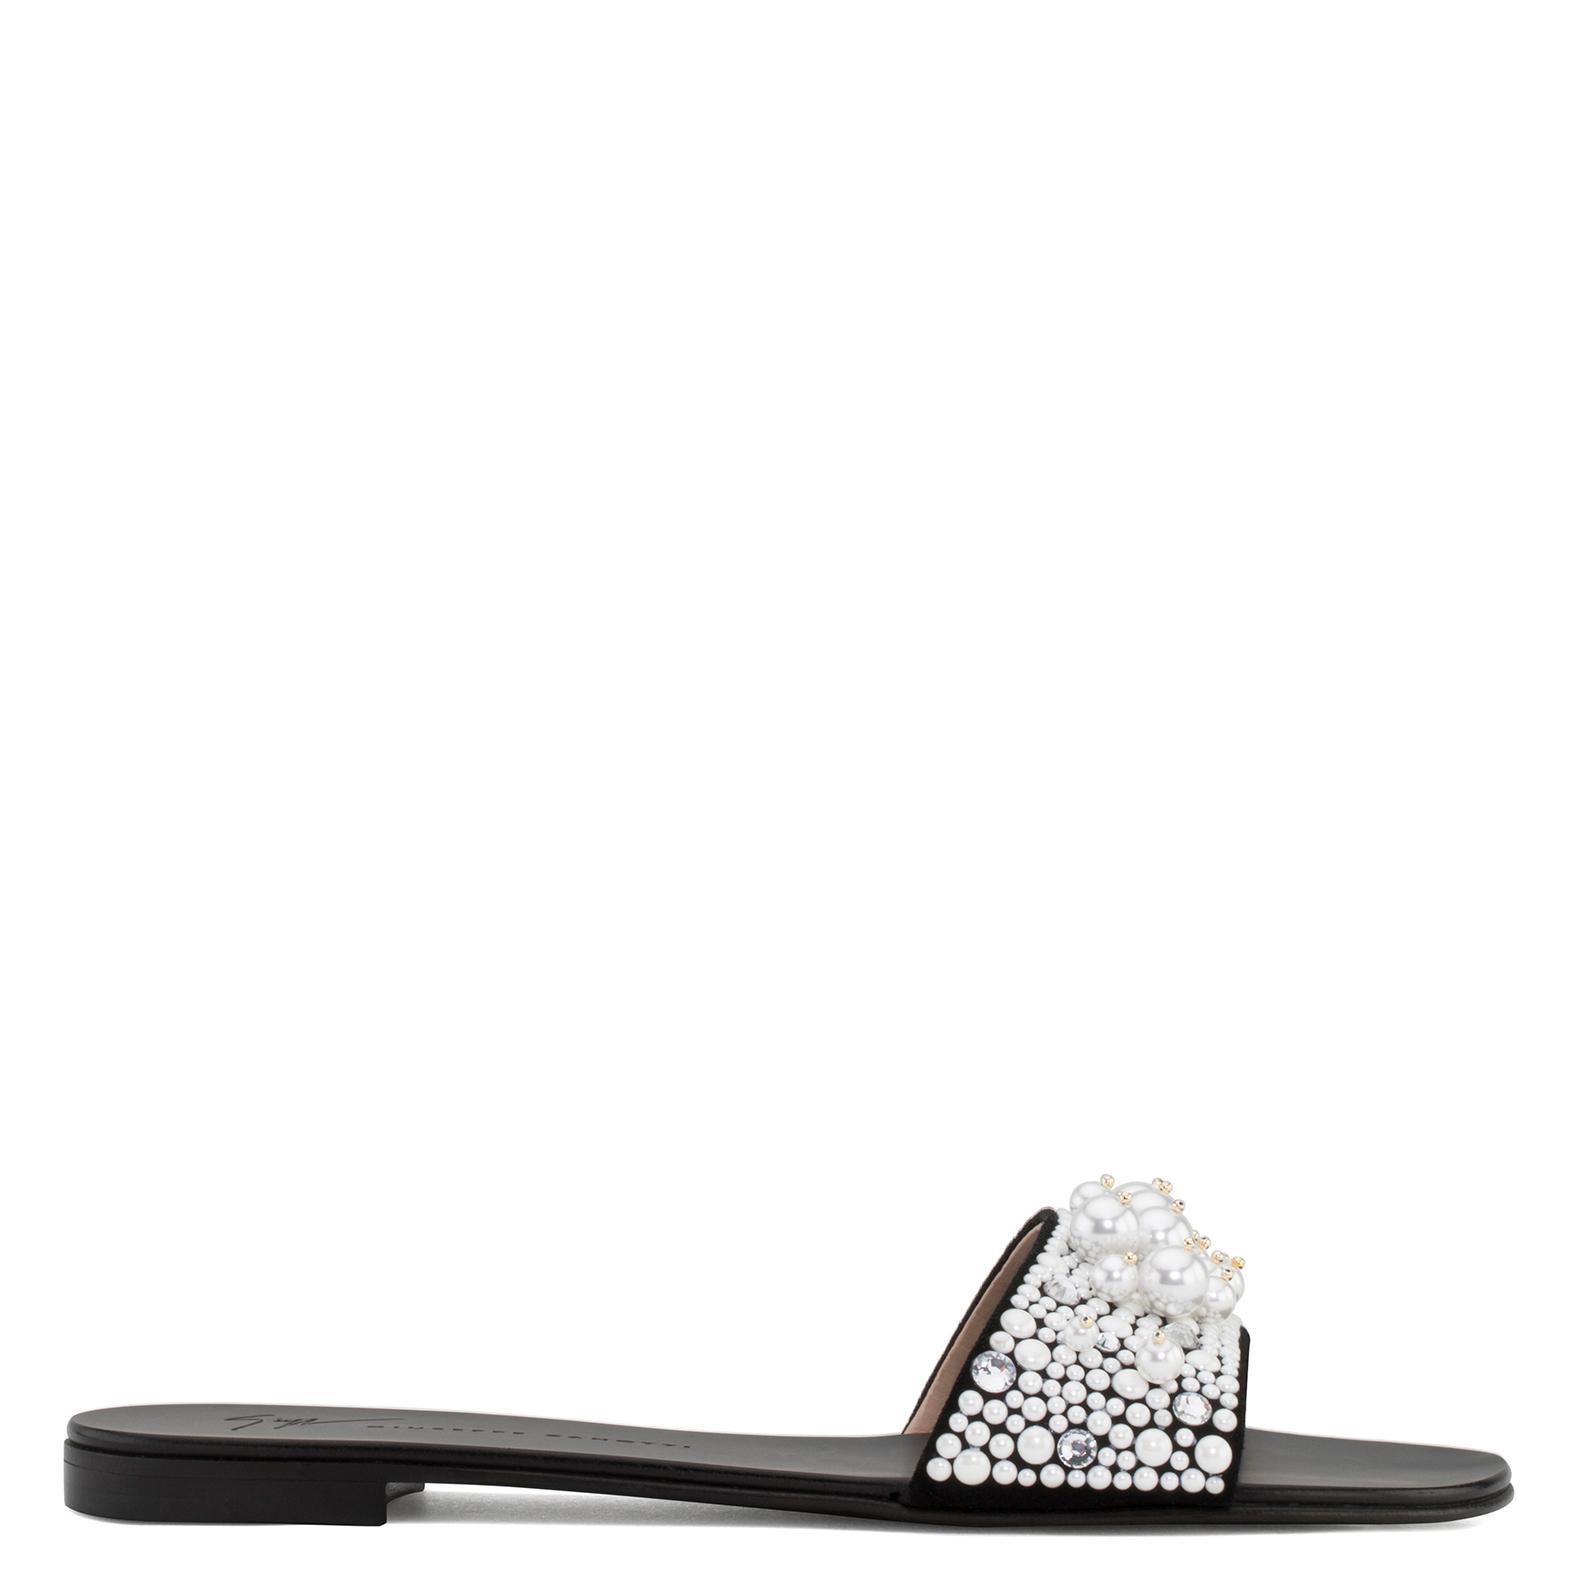 Vanessa Embellished Leather Slides - Black Giuseppe Zanotti R8DulcEw